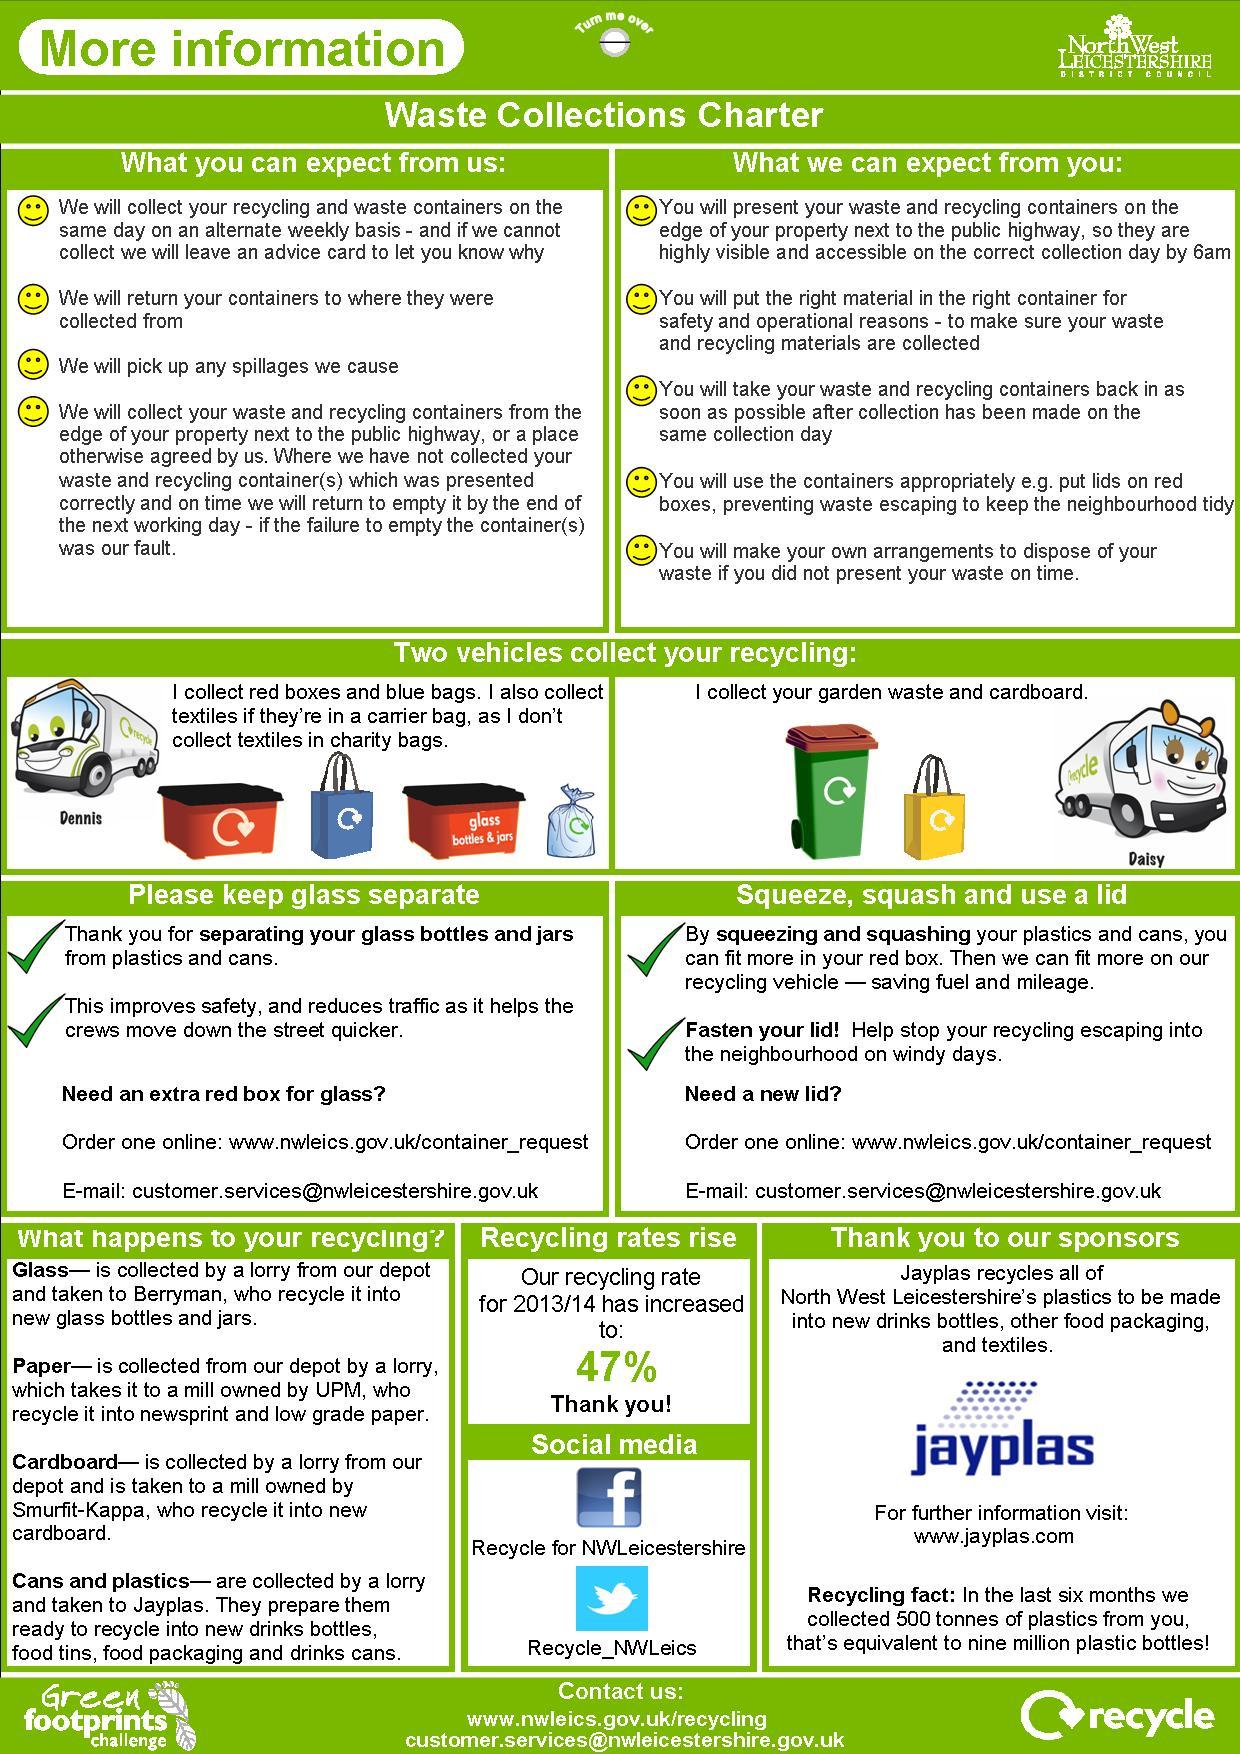 Recycling & refuse collection calendar 2014-15 rear cover